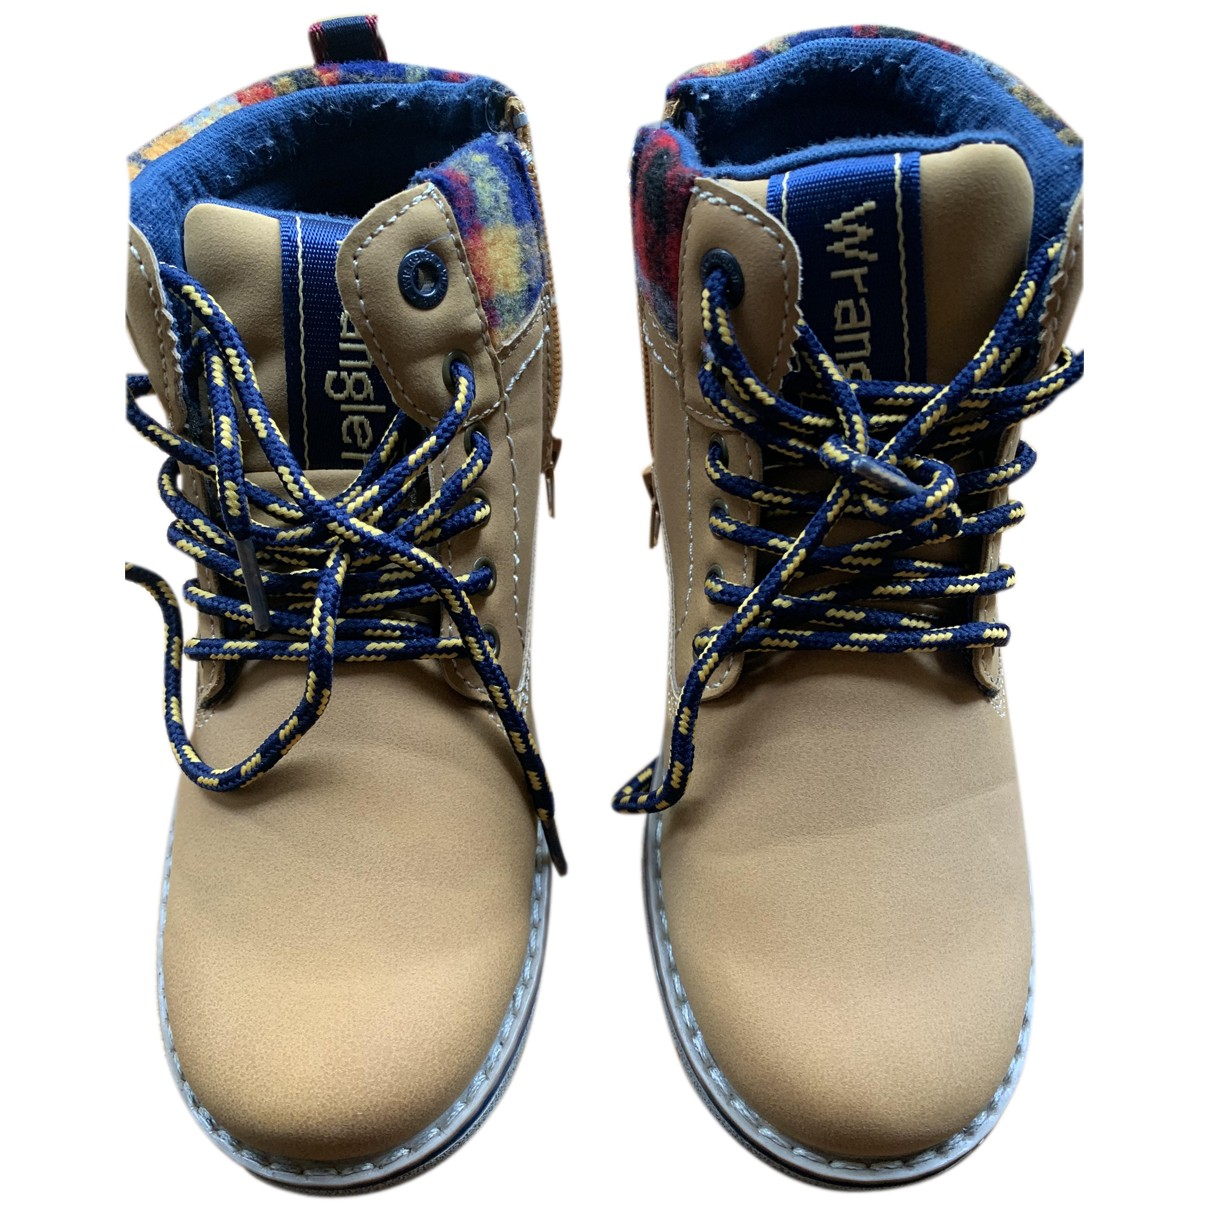 Botas de Cuero Wrangler